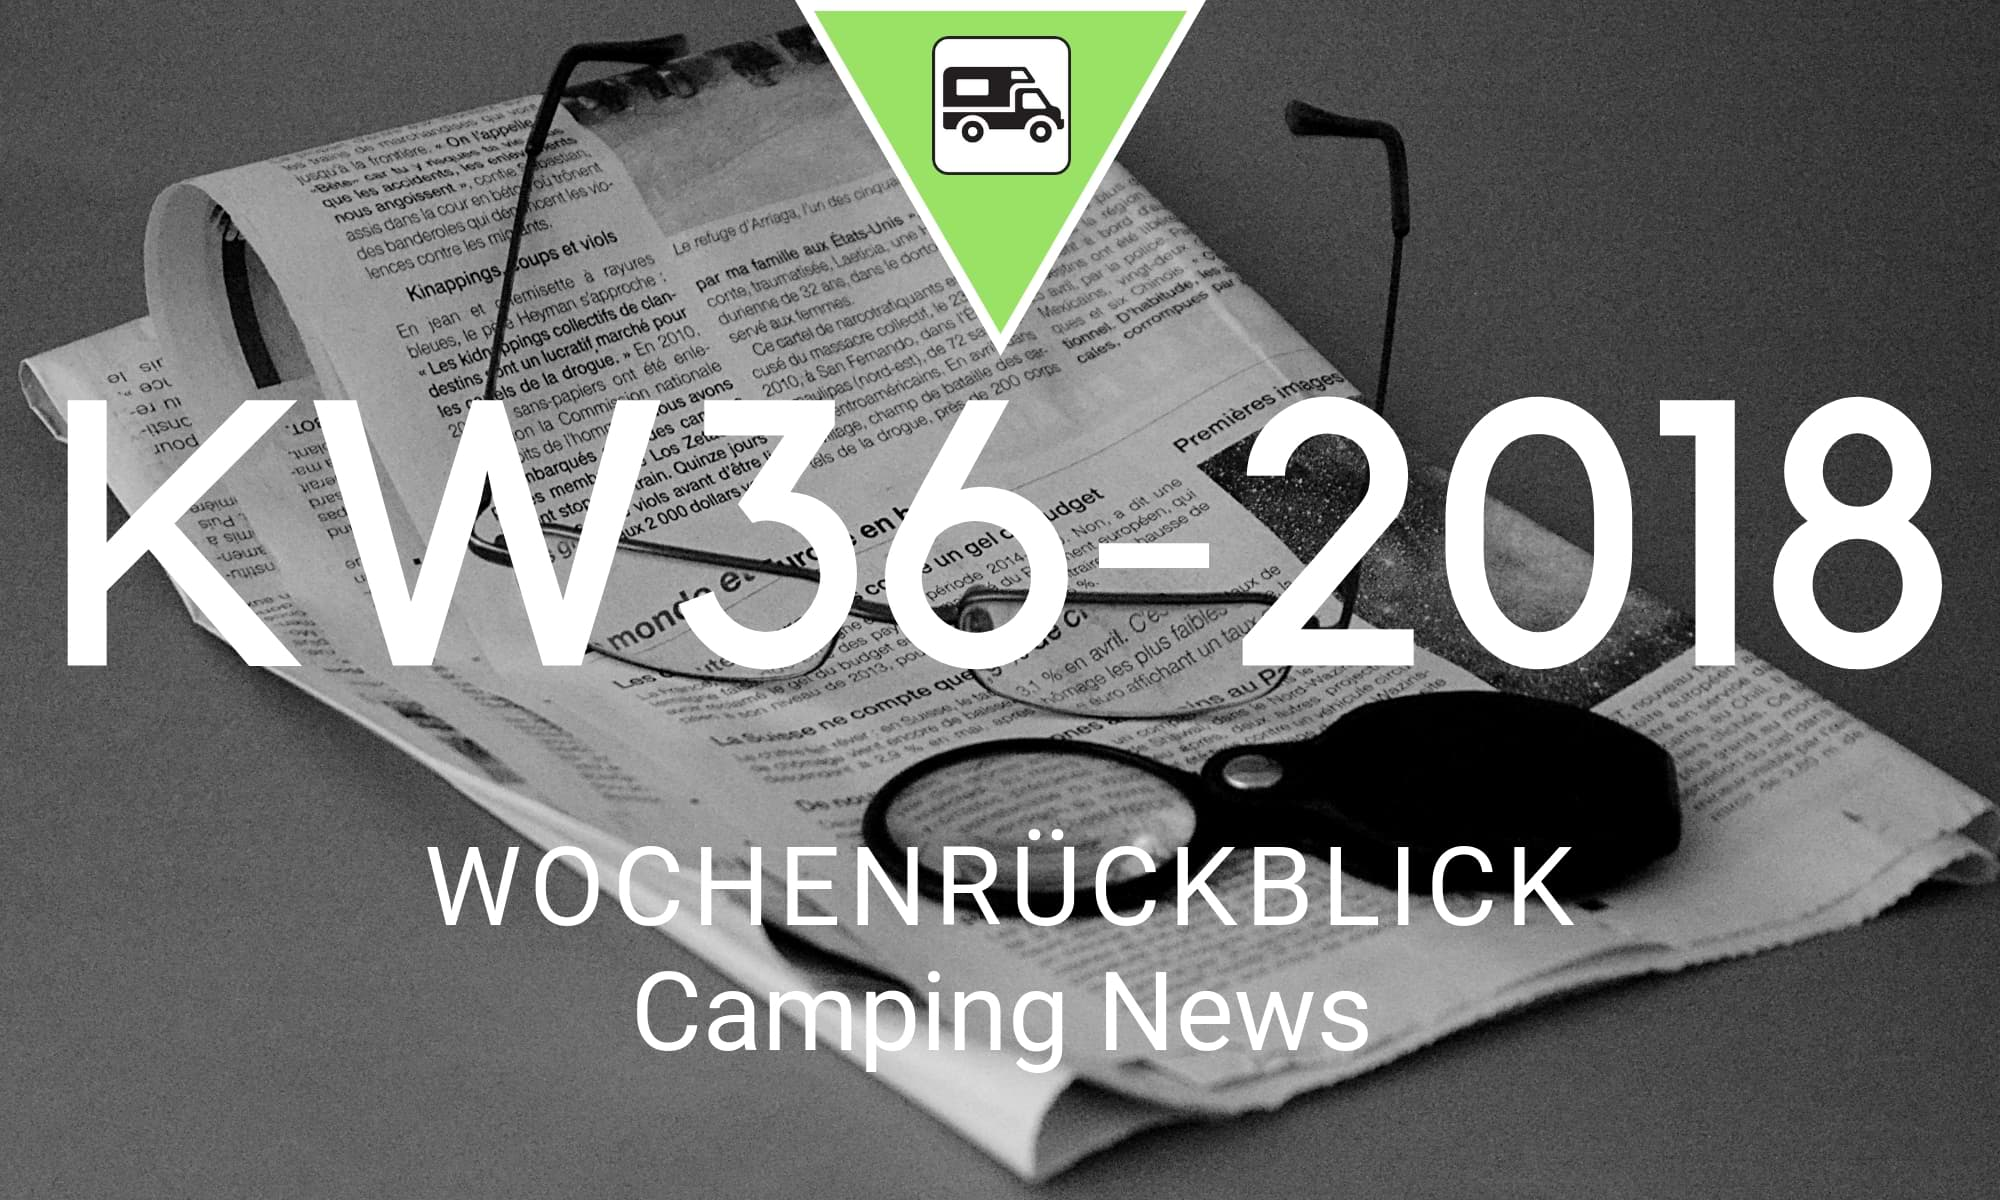 Wochenrückblick Camping News KW36-2018